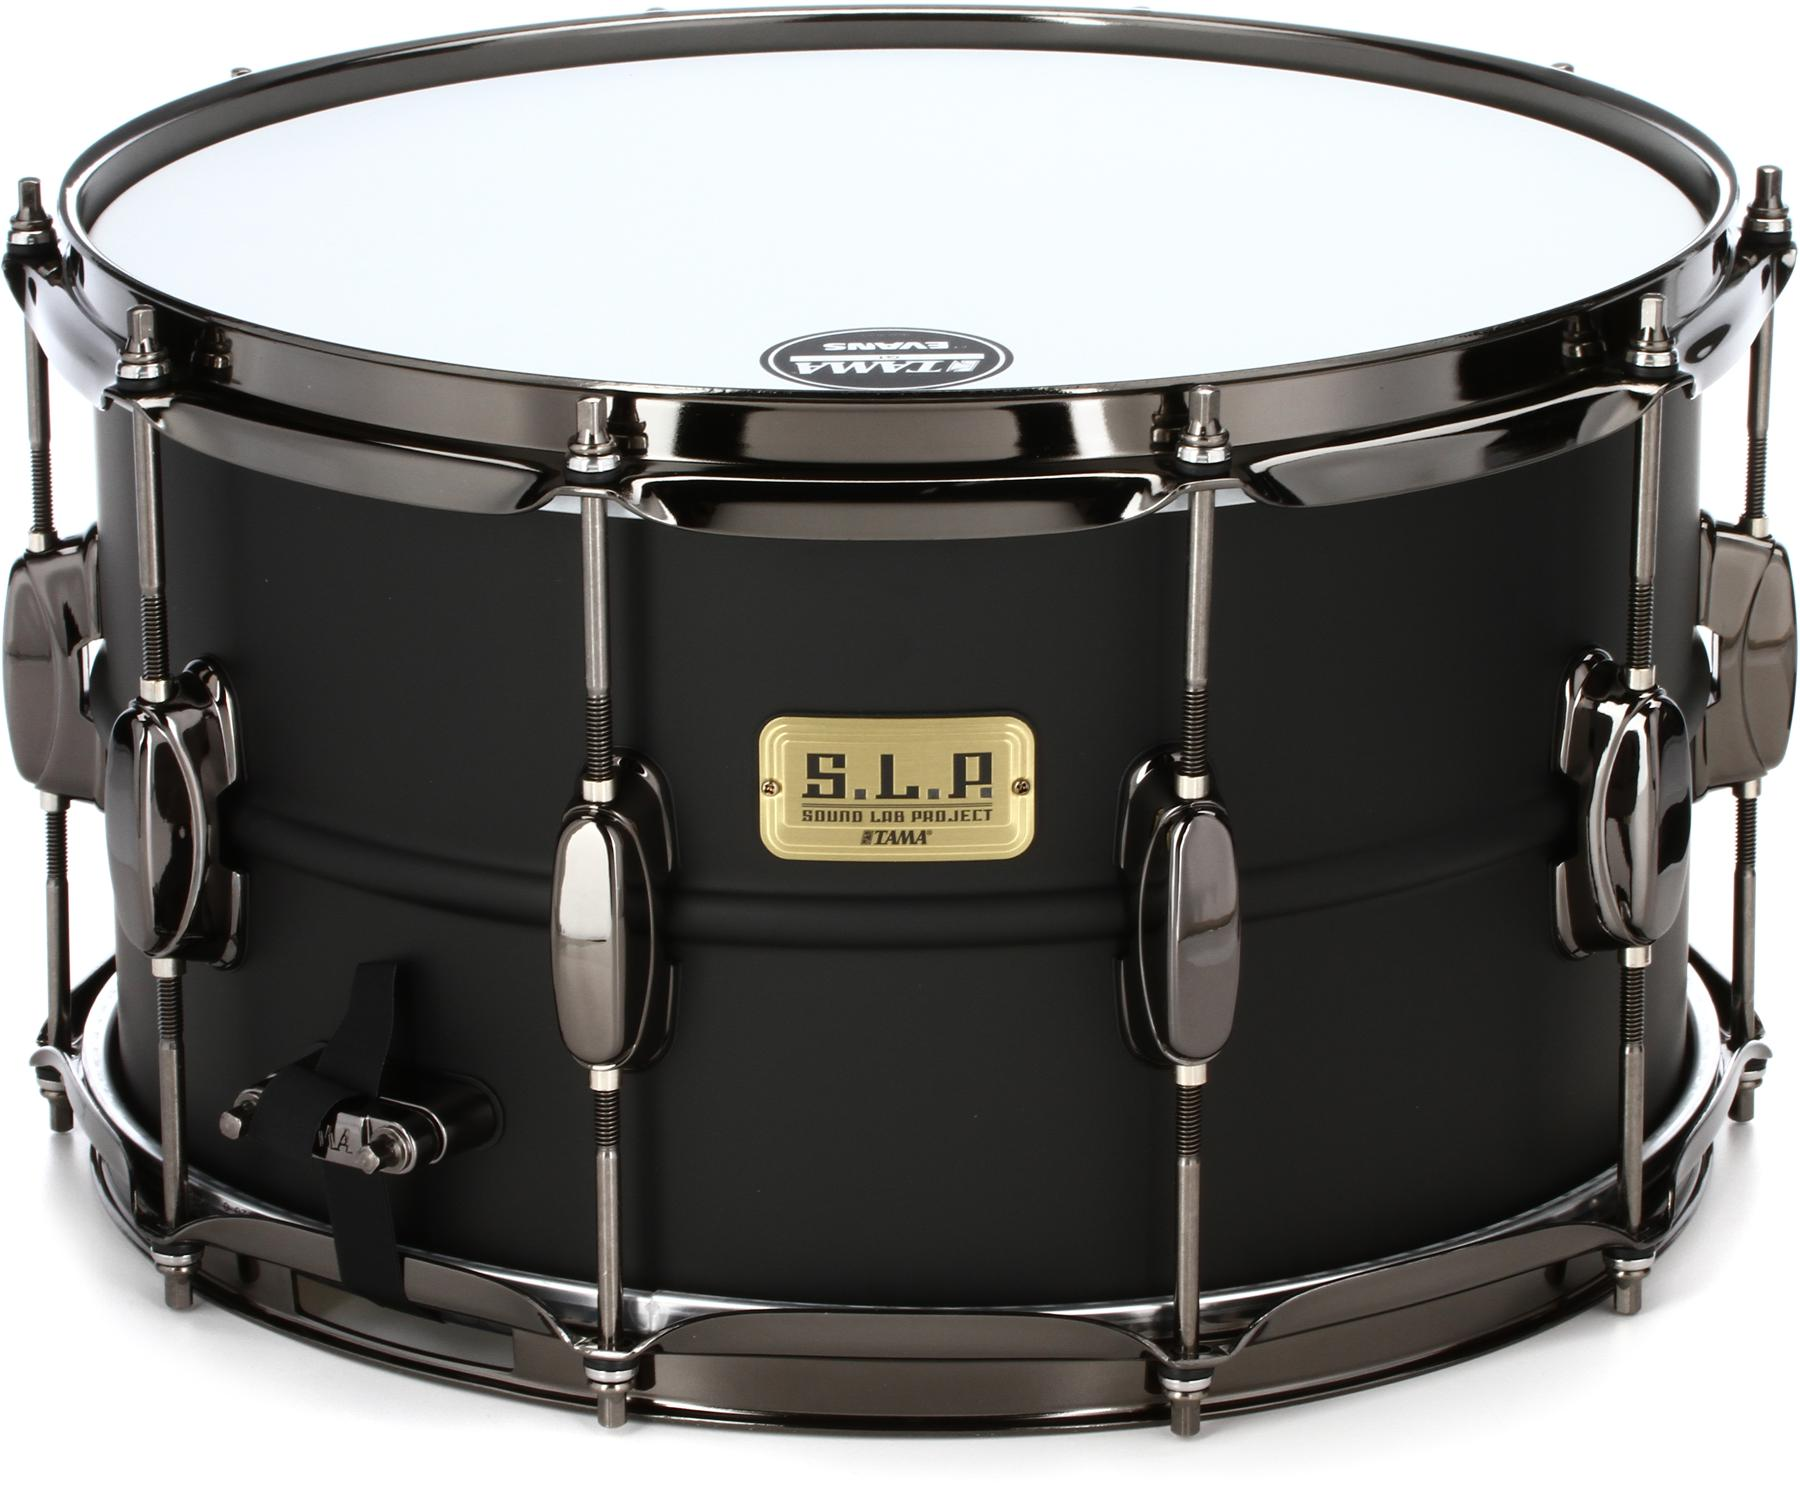 3. Tama S.L.P. Big Black Steel Snare Drum 14 x 8 in